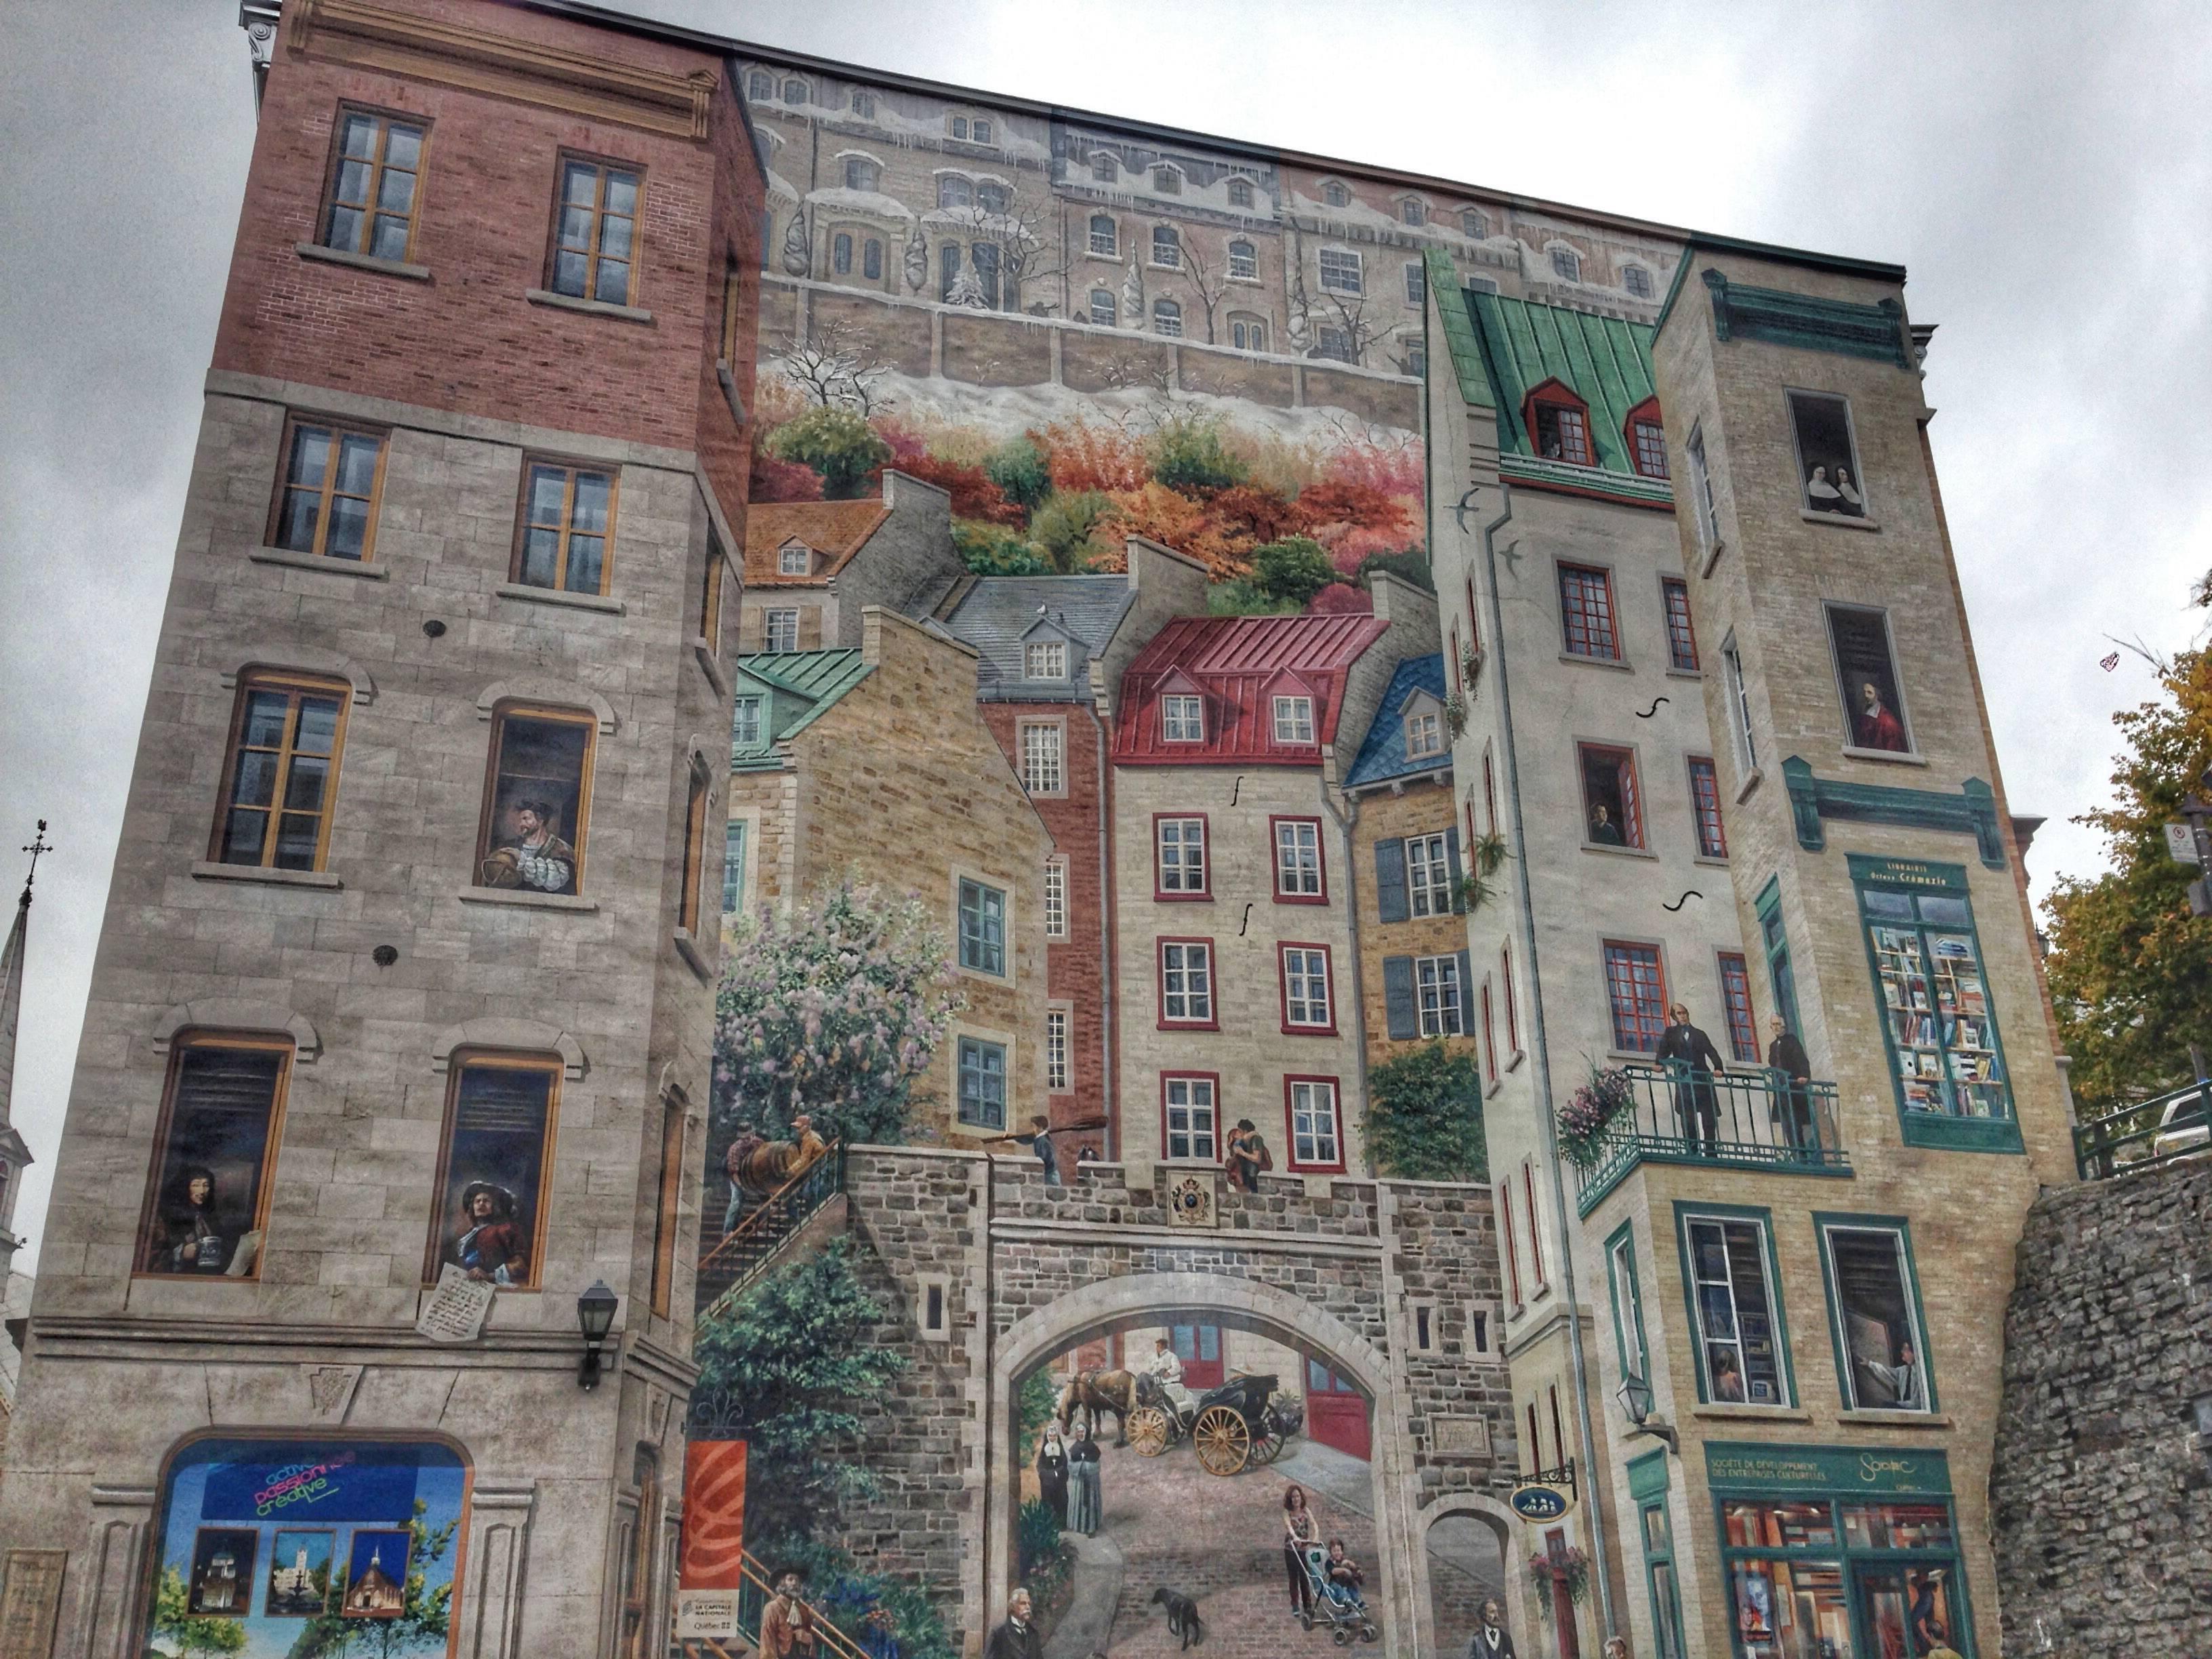 Photo 3: Quartier du Vieux-Québec